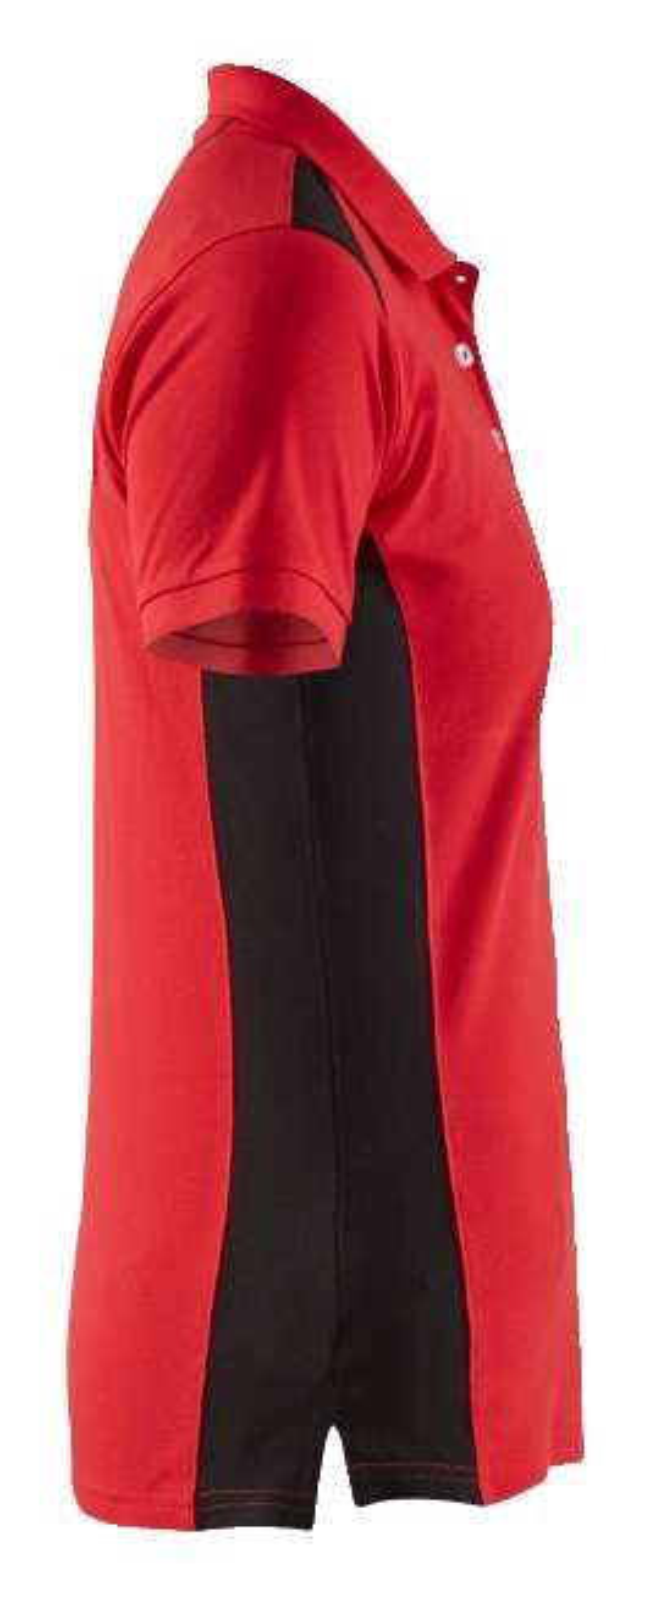 Blaklader Dames polo shirts 33901050 rood-zwart(5699)